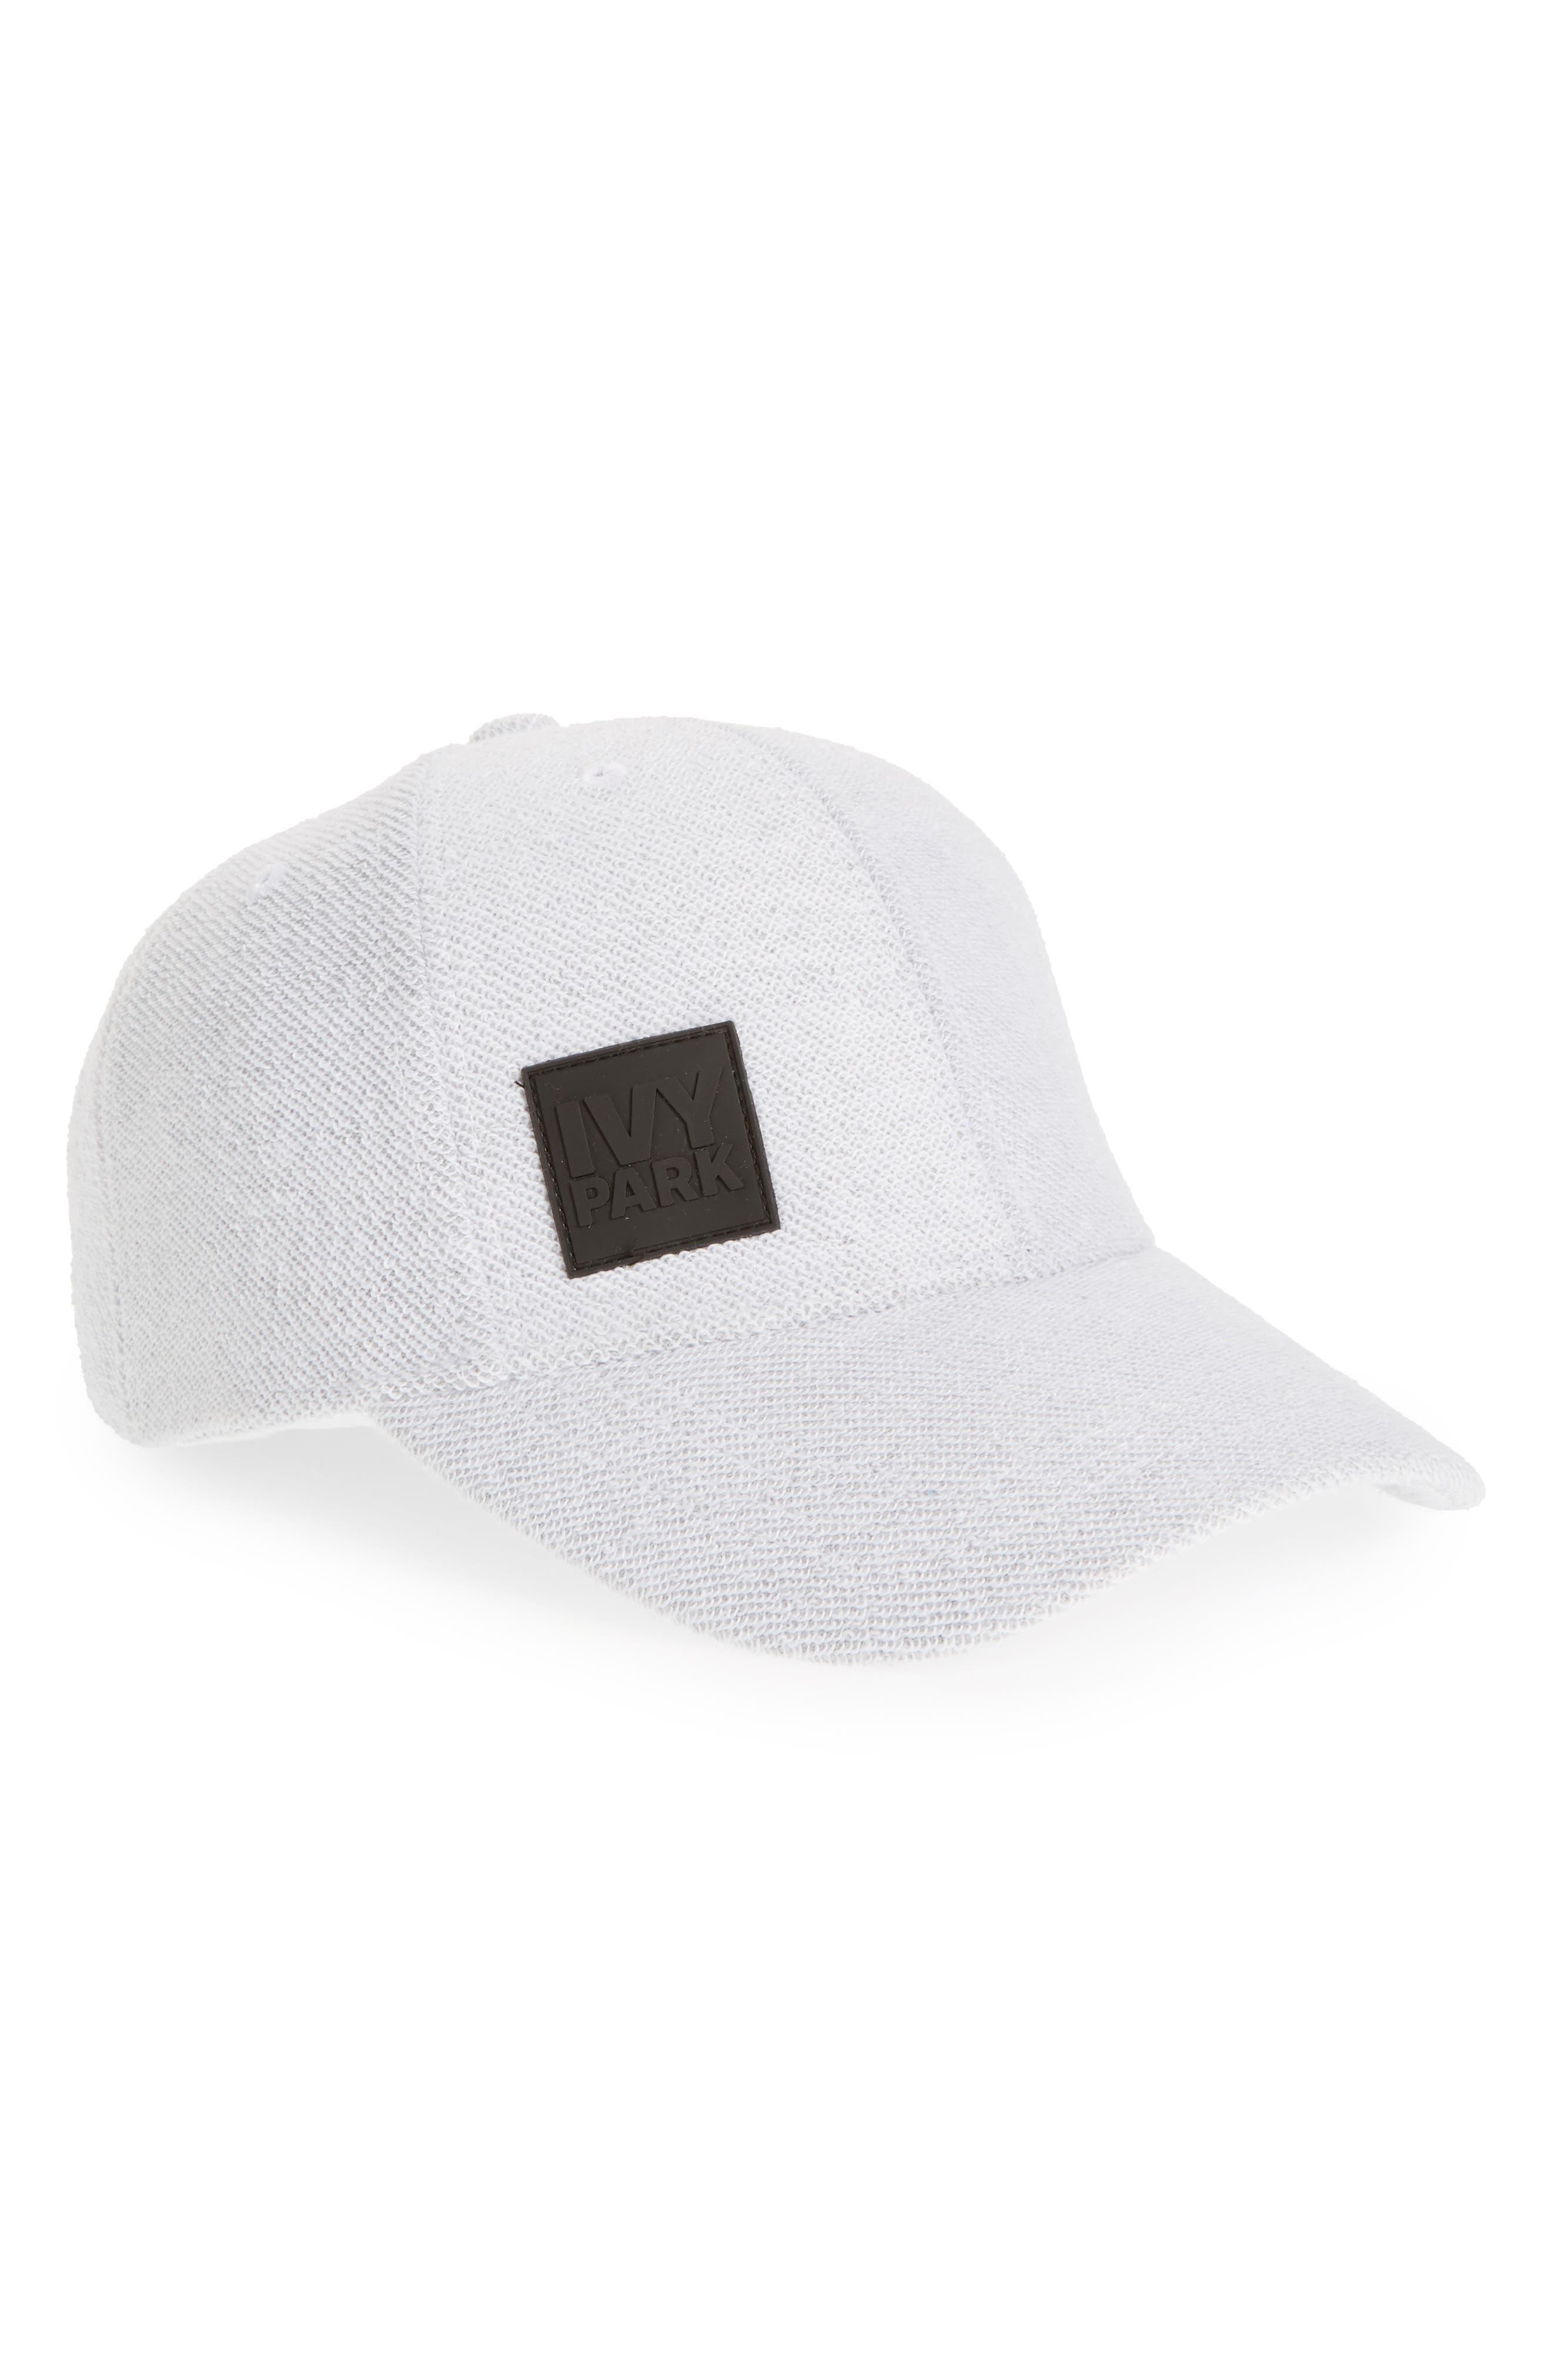 Loopback Jersey Baseball Cap,                         Main,                         color, 020